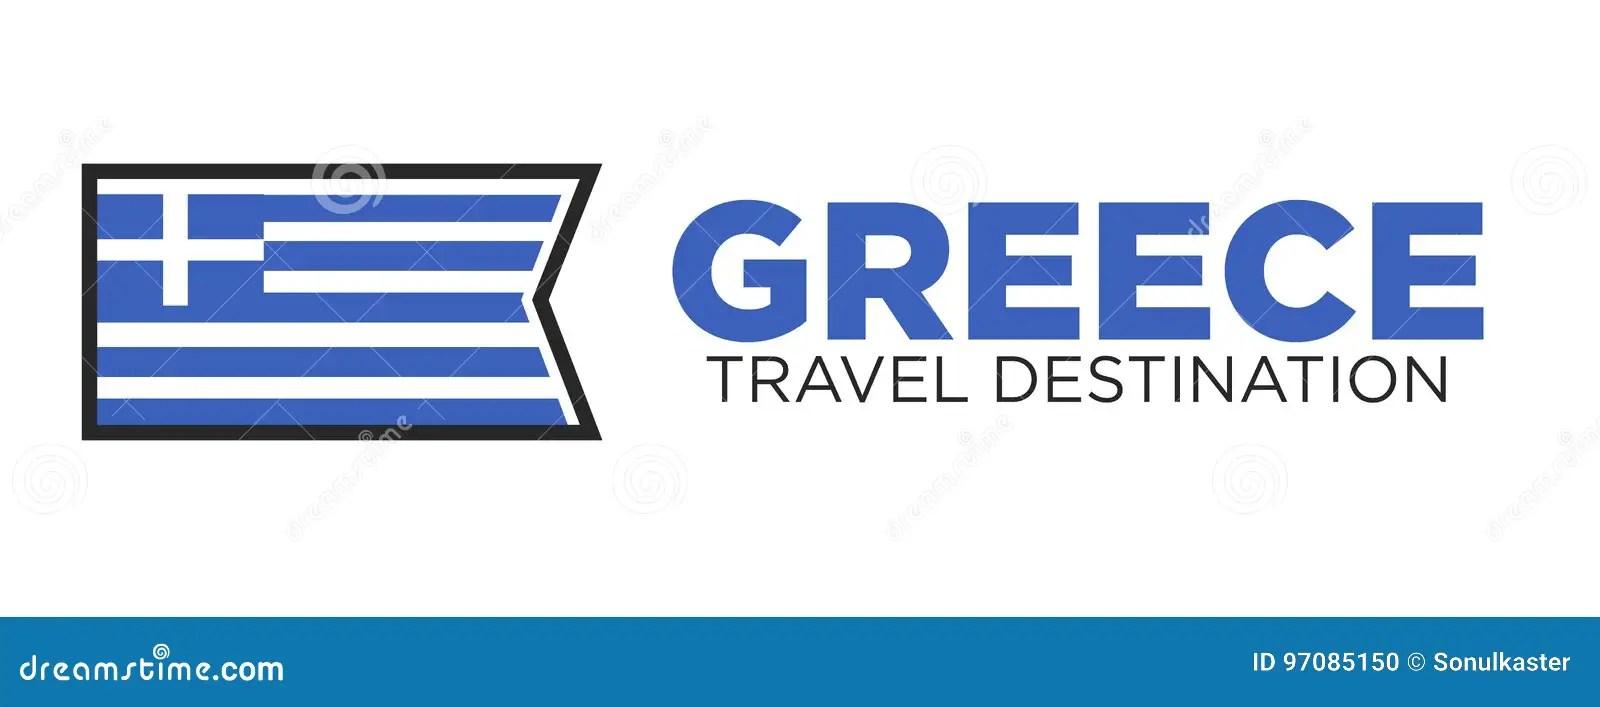 Greece Travel Destination Logo Stock Vector - Illustration of simple